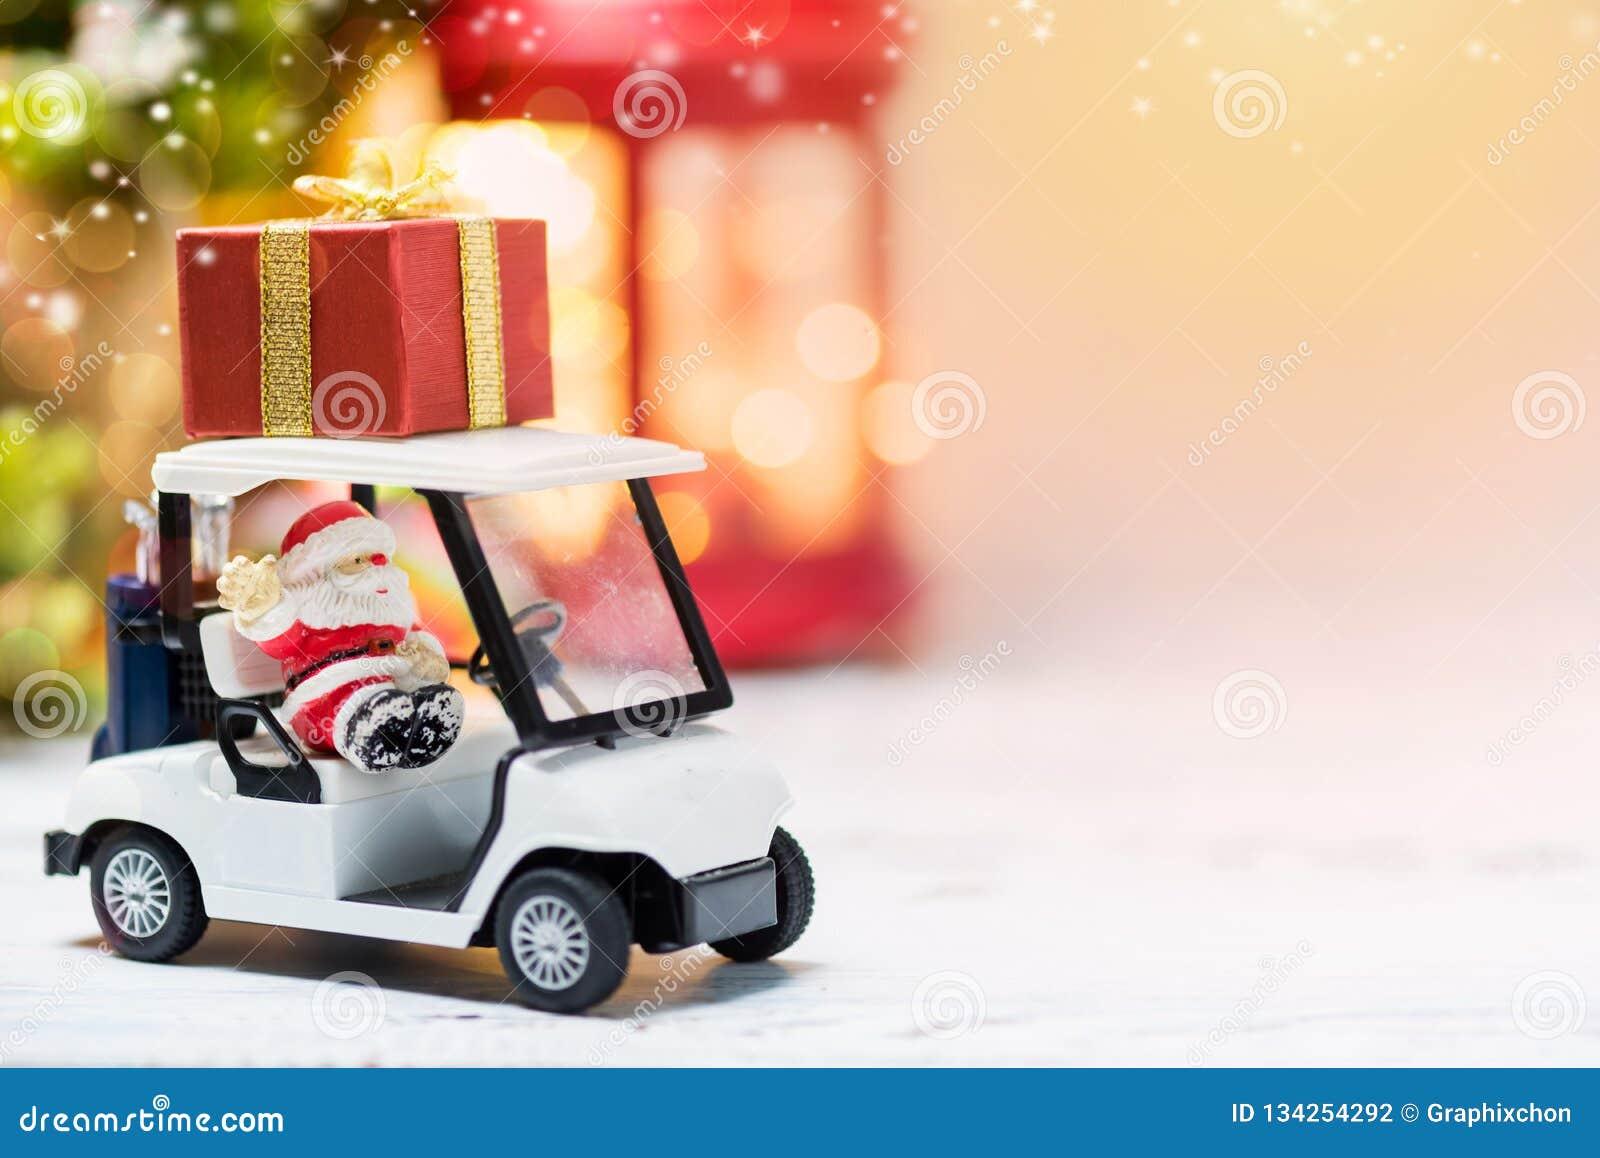 Golf Cart Christmas Decorations.Santa On Golf Car For Christmas Stock Photo Image Of